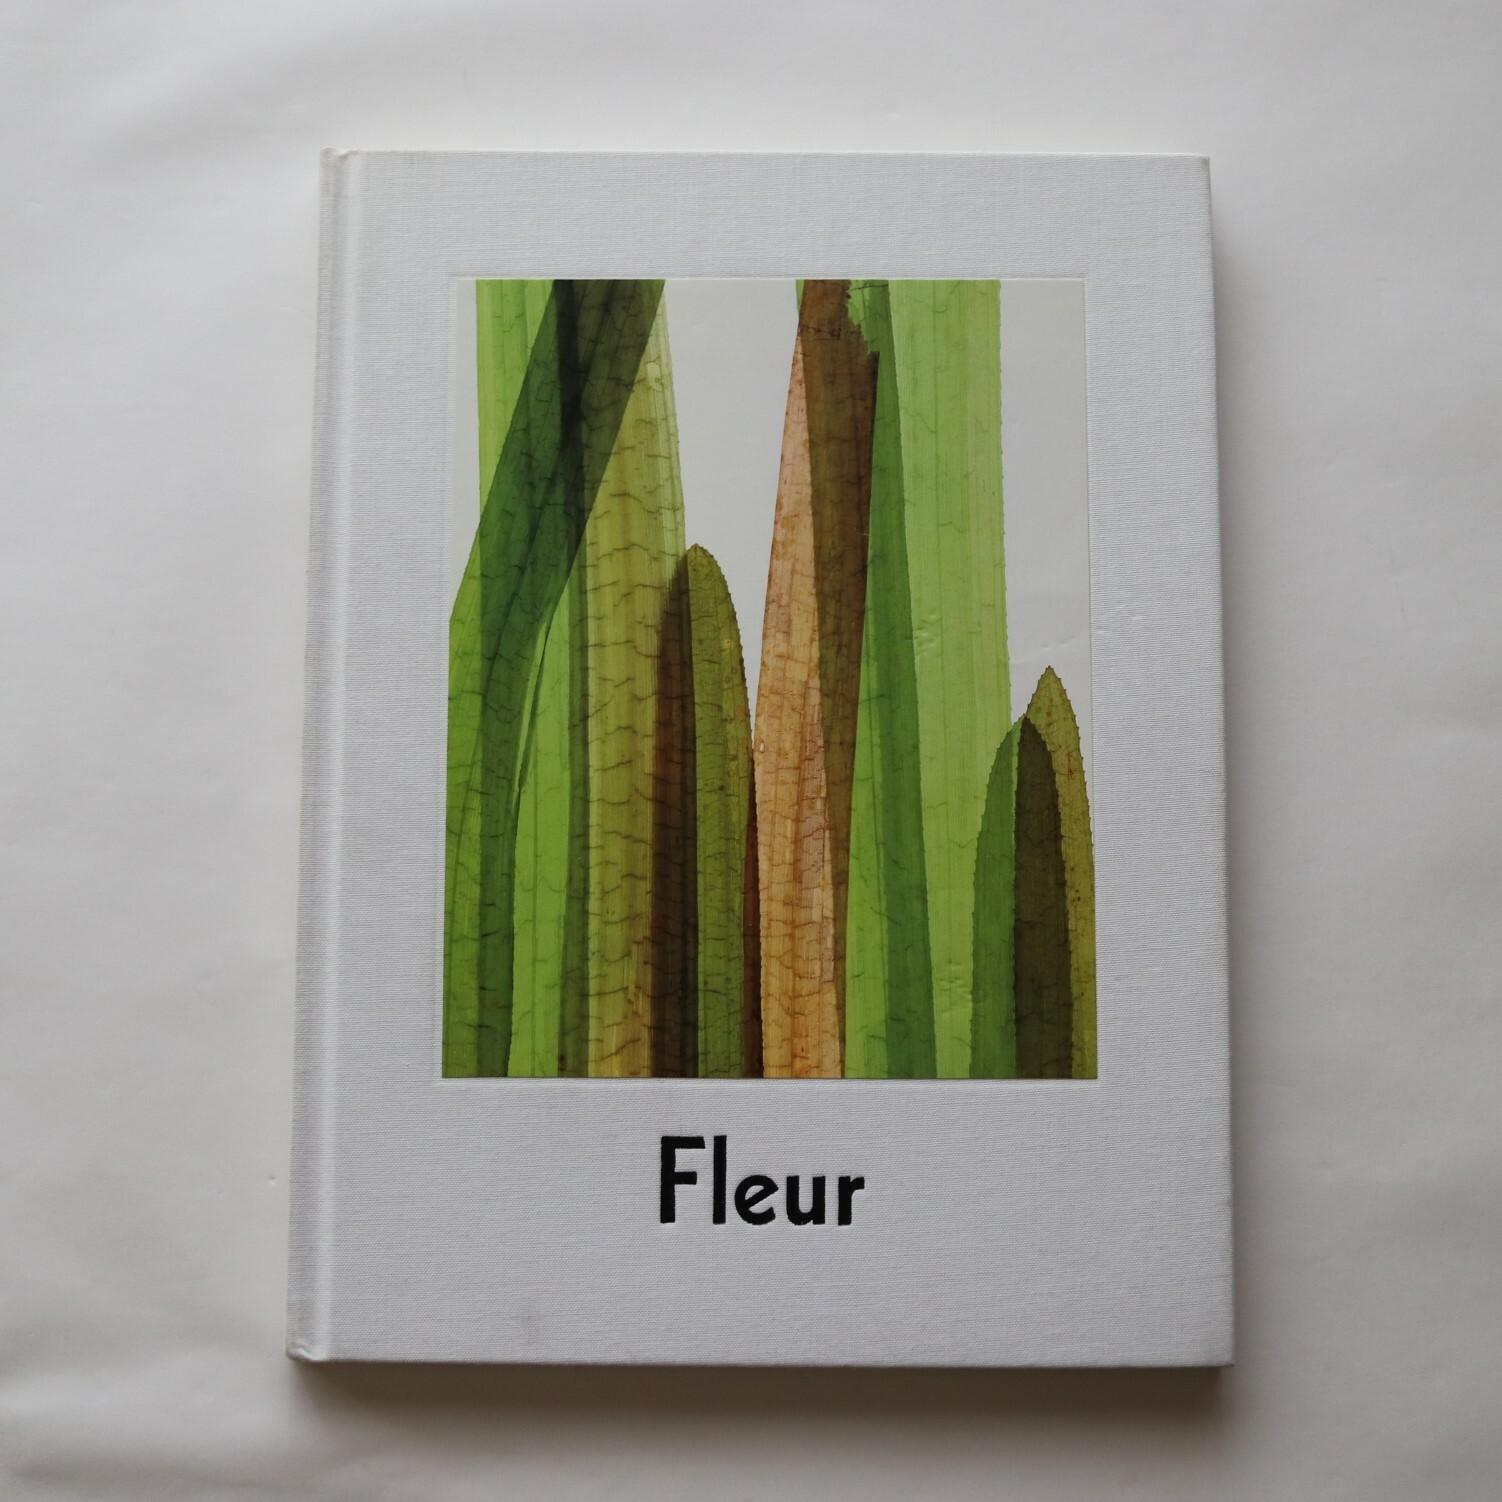 Fleur Olby: Plant Portraits / Fleur Olby / fuel publishing